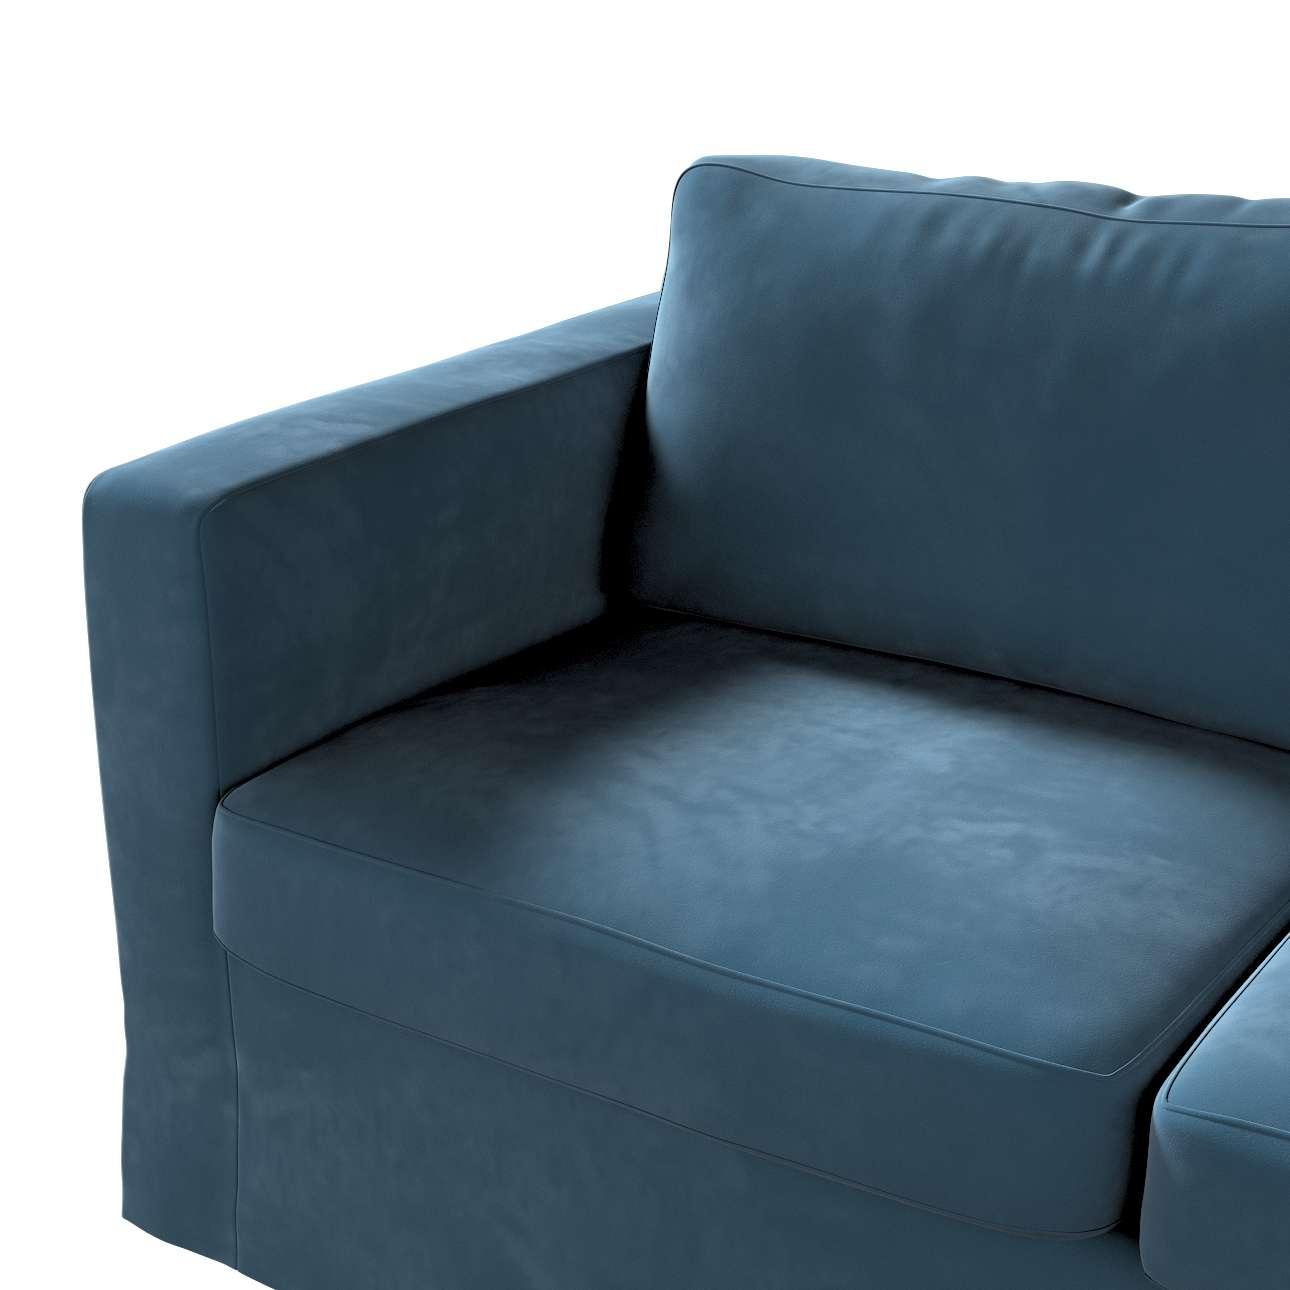 Floor length Karlstad 2-seater sofa cover in collection Velvet, fabric: 704-16